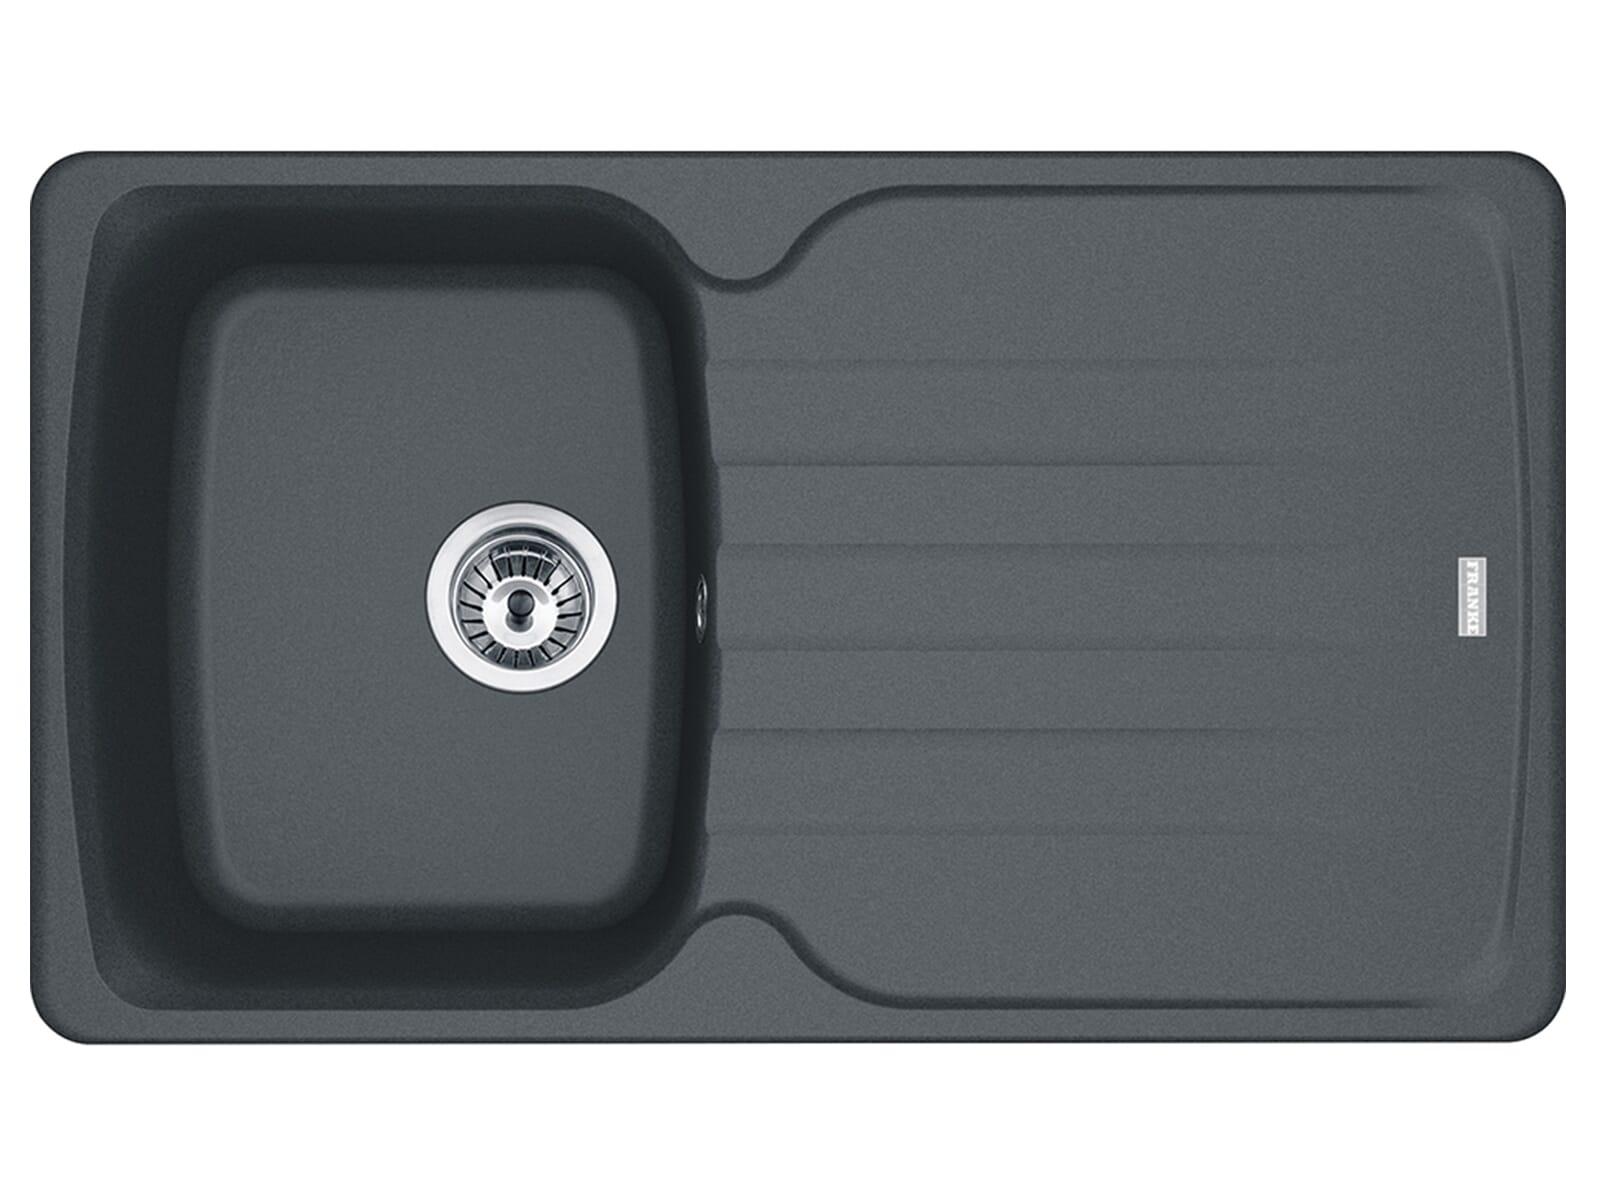 Franke Antea AZG 611 Graphit - 114.0477.976 Granitspüle Exzenterbetätigung